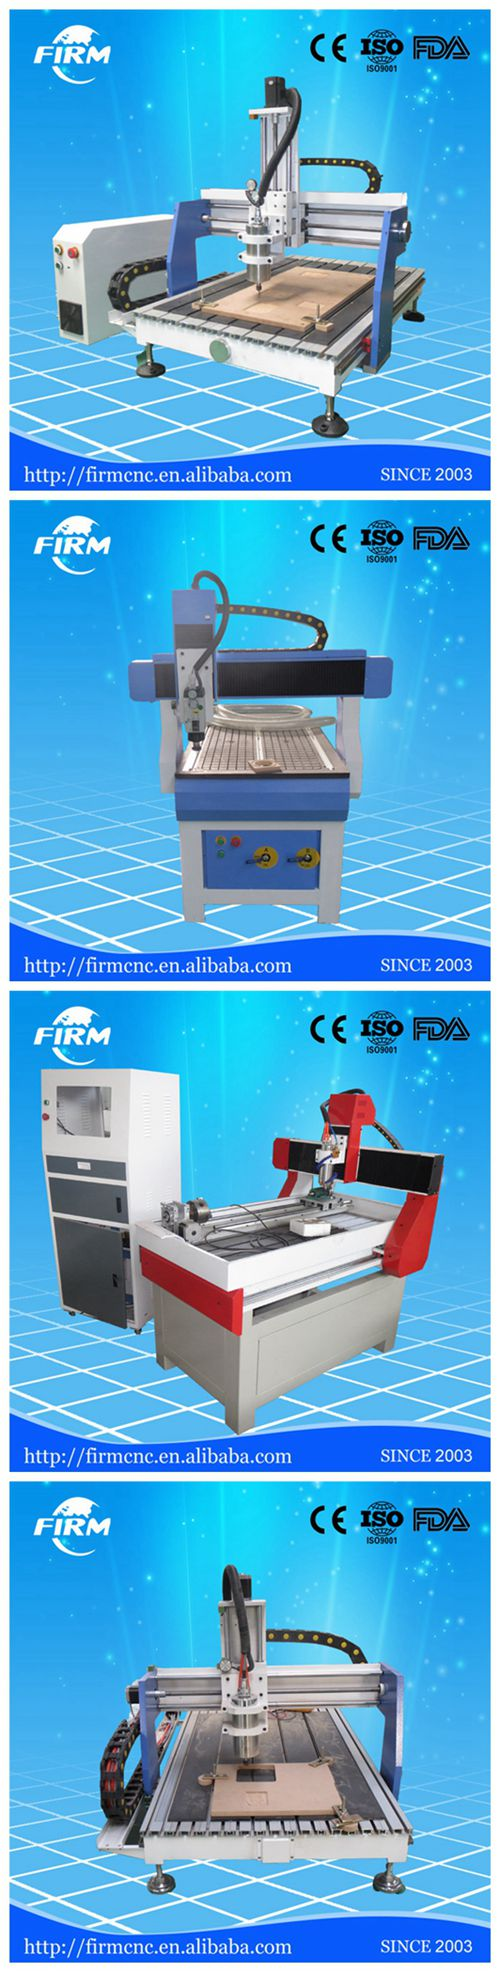 hobby mini desktop advertising cnc router machine for sale